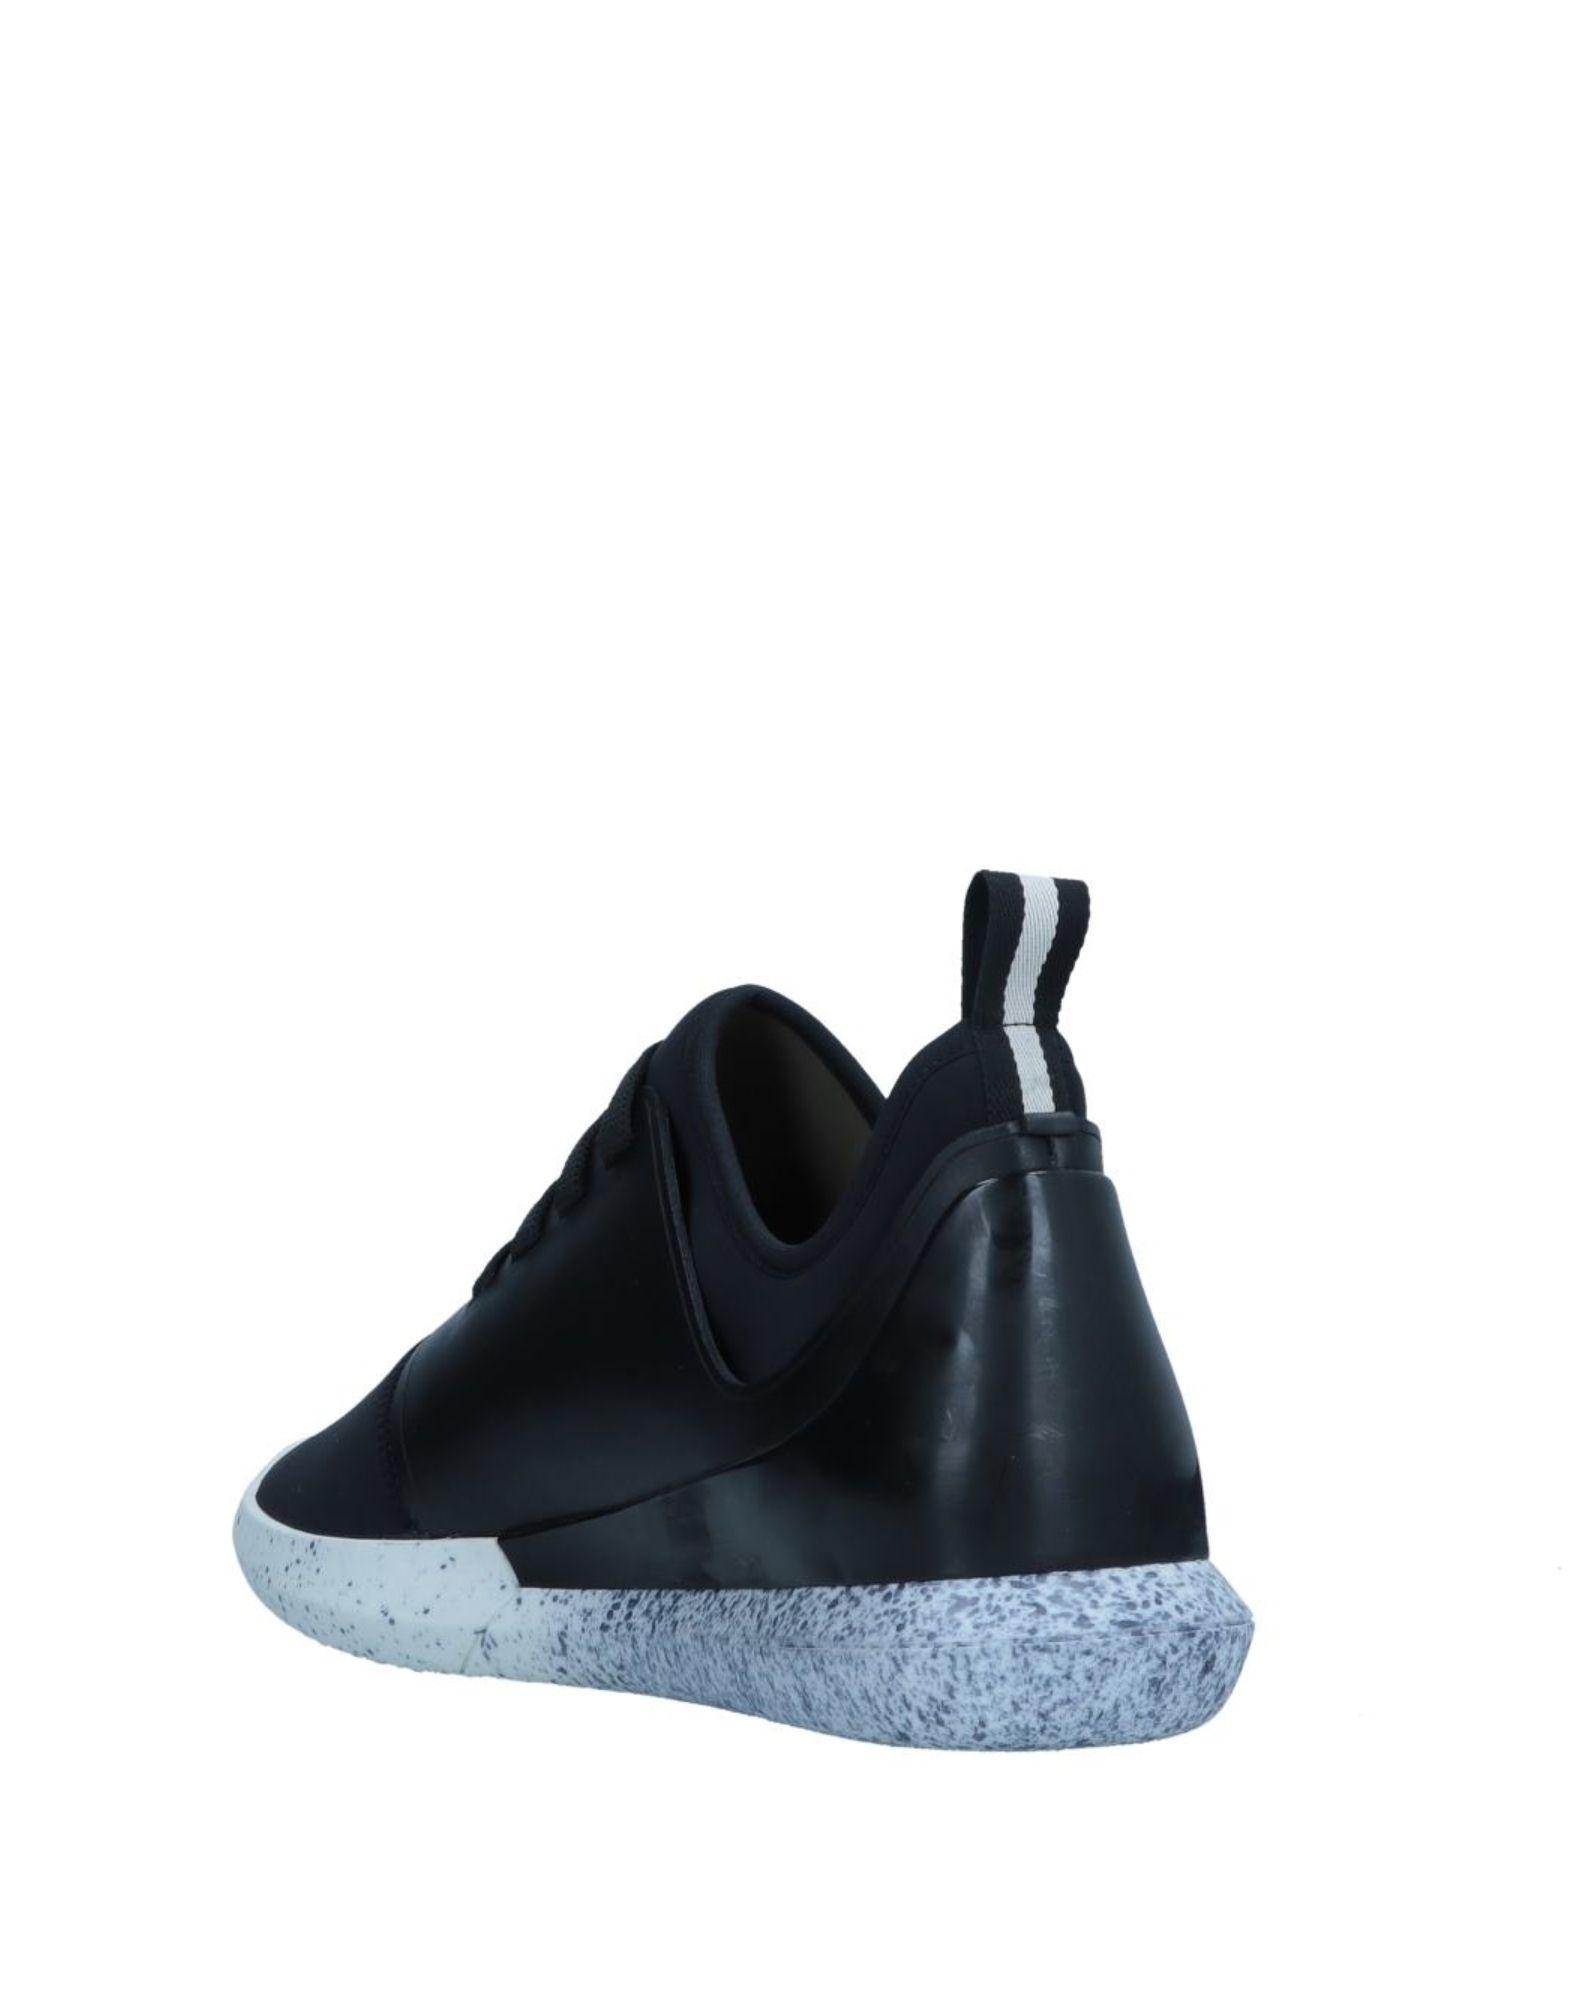 Bally Sneakers Herren  11550462DQ Schuhe Gute Qualität beliebte Schuhe 11550462DQ 4eeaed